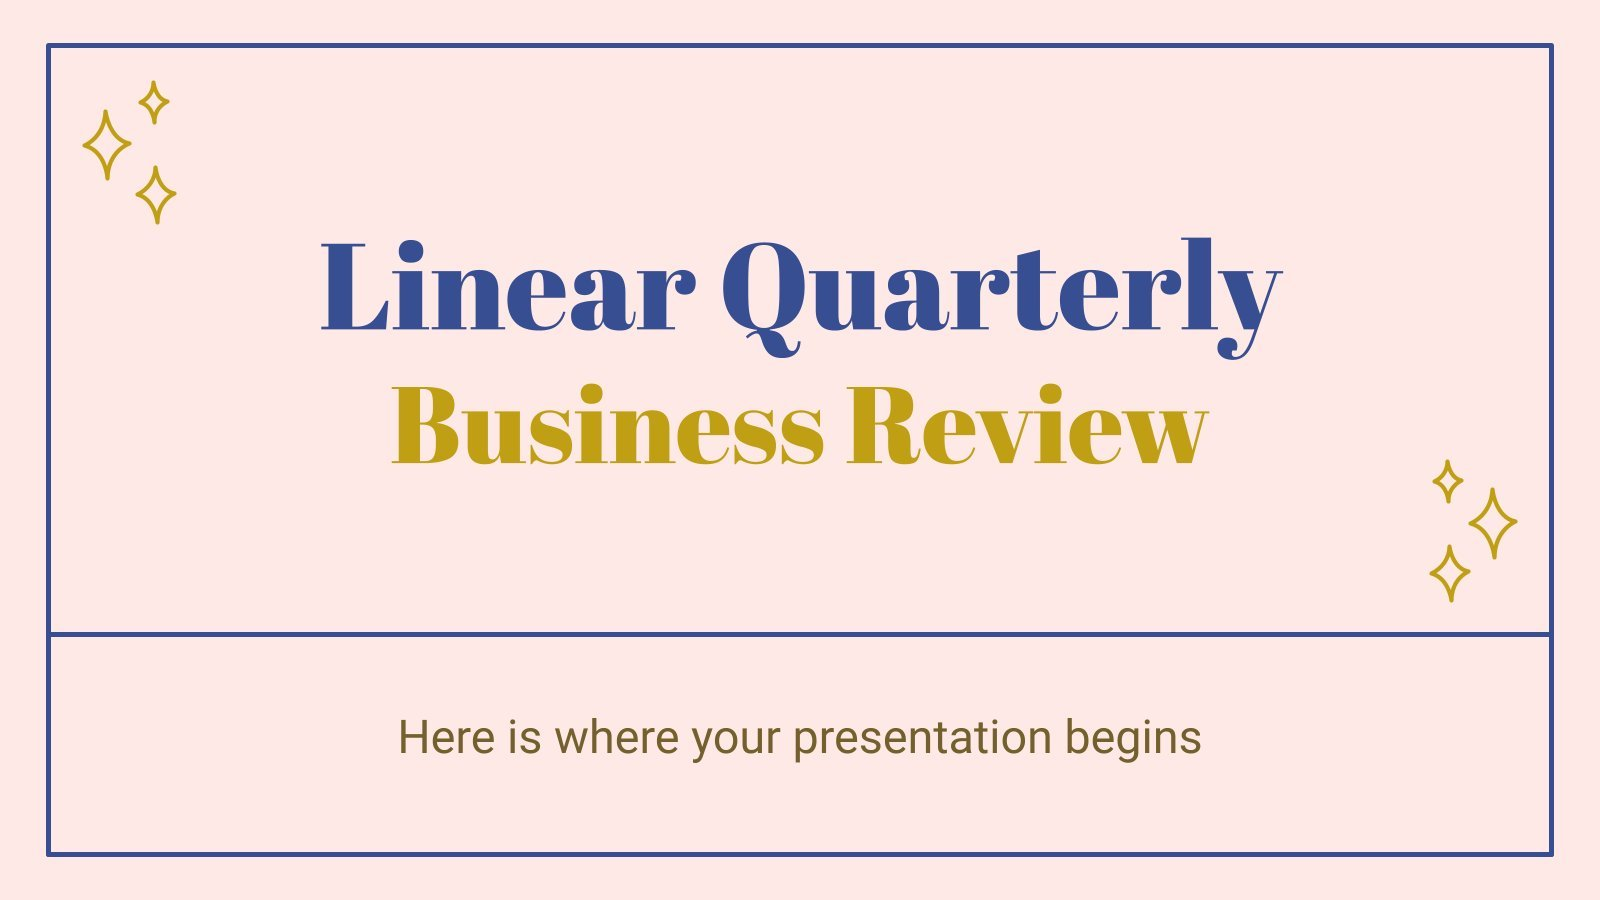 Linear Quarterly Business Review presentation template